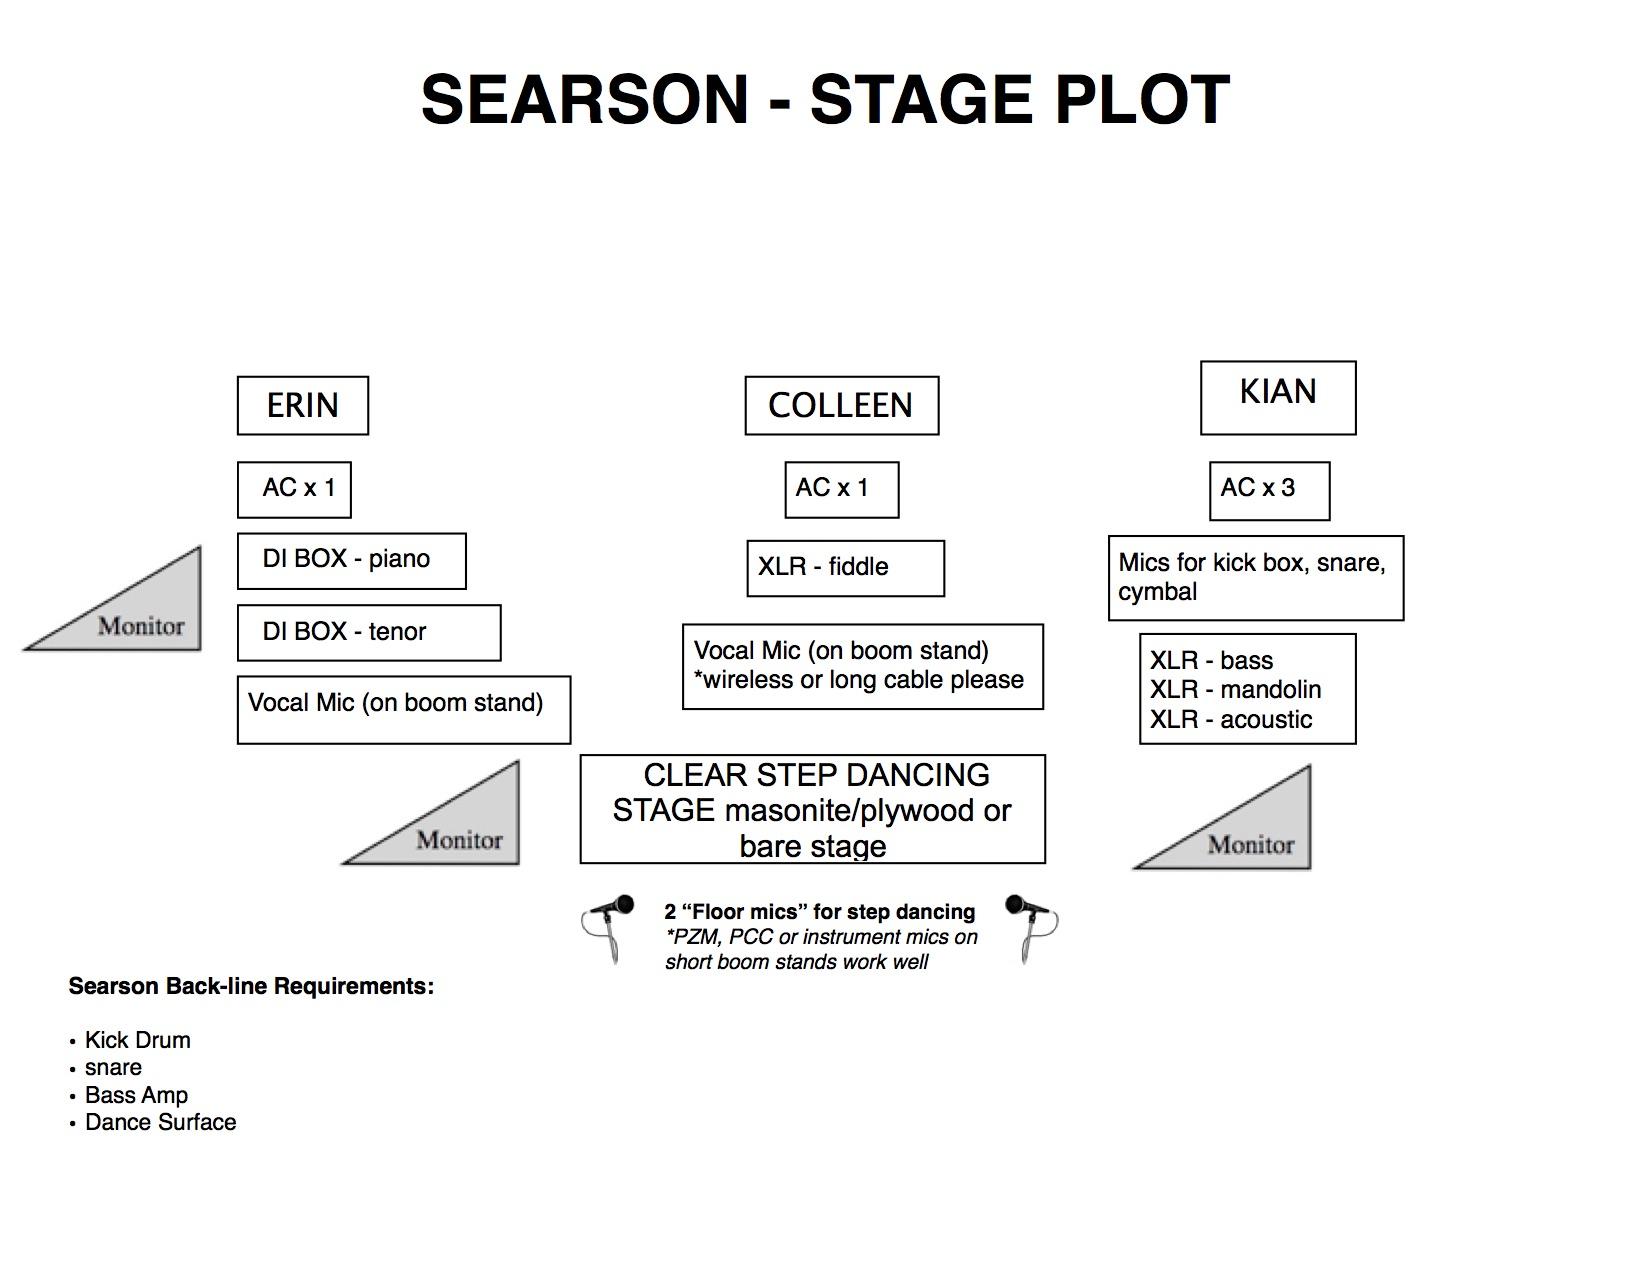 Searson Stage Plot 2019KIAN (wedges, Festival backline) copy 4.jpg